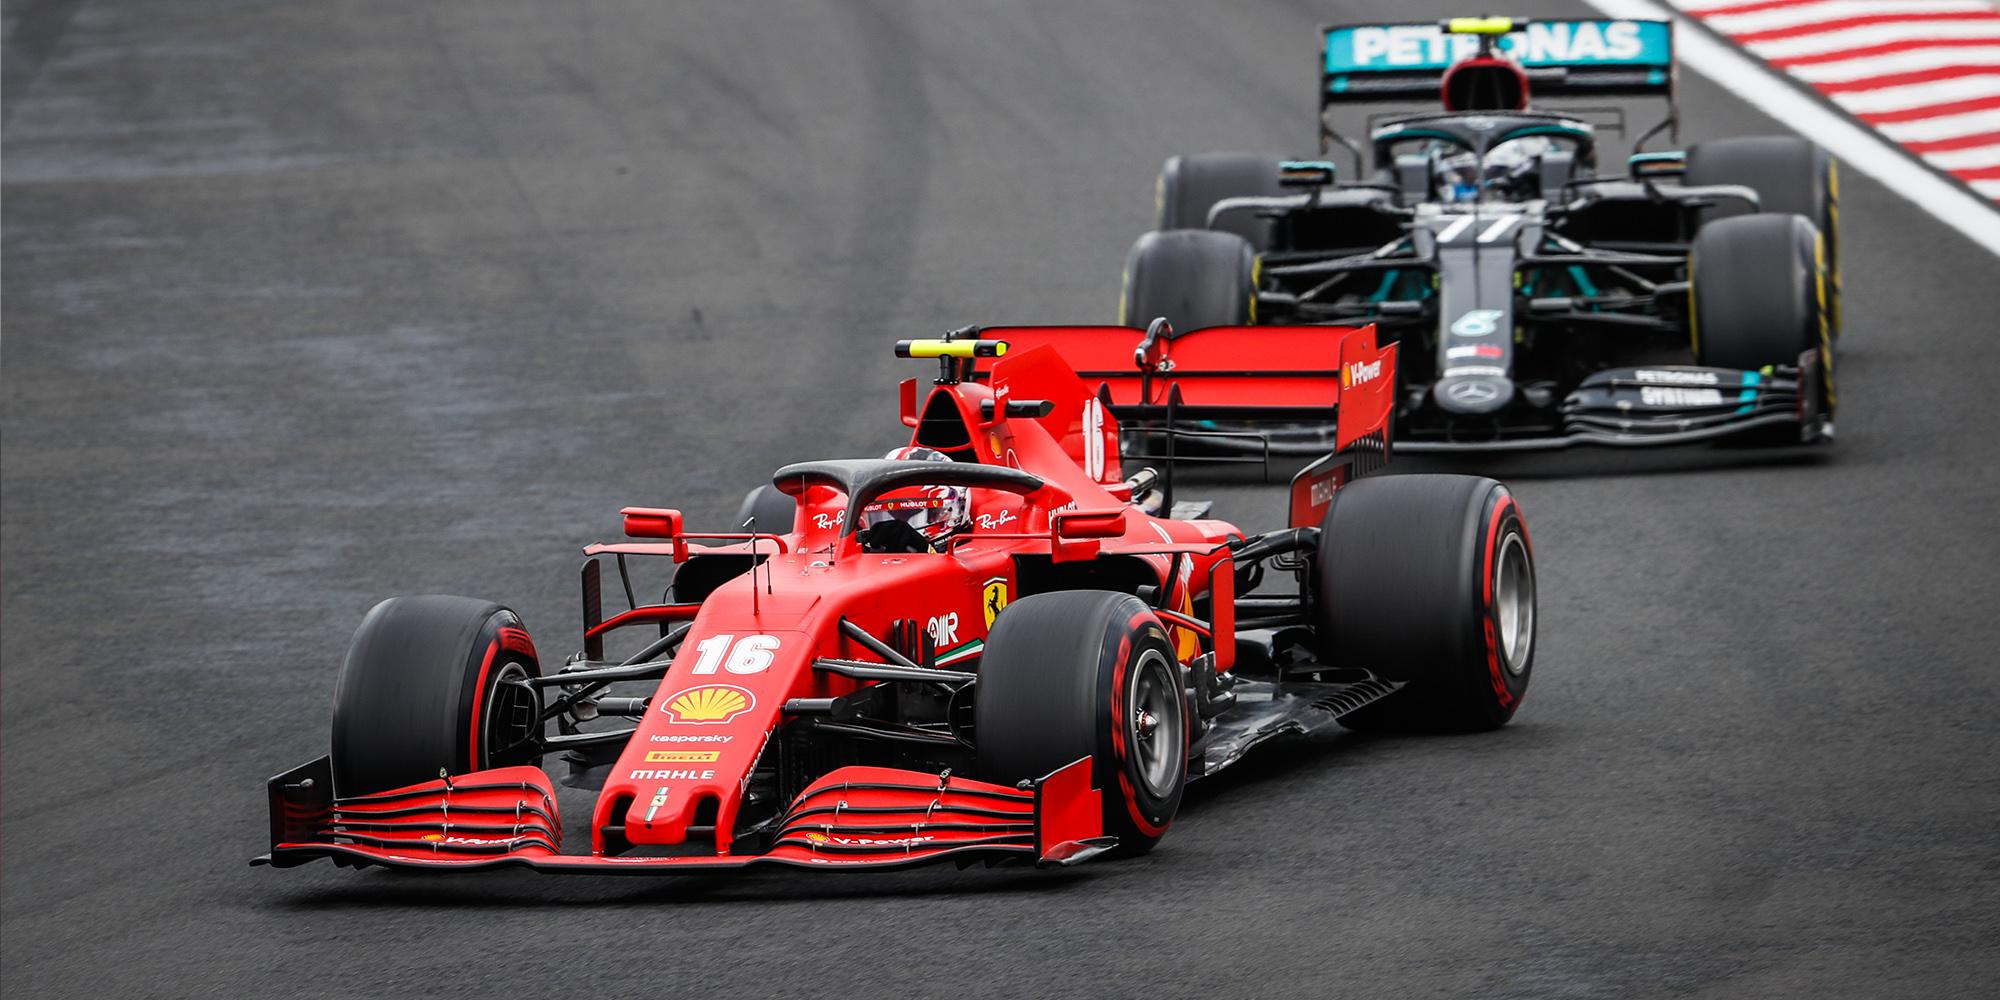 Charles Leclerc ahead of Valtteri Bottas in the 2020 F1 Hungarian Grand Prix